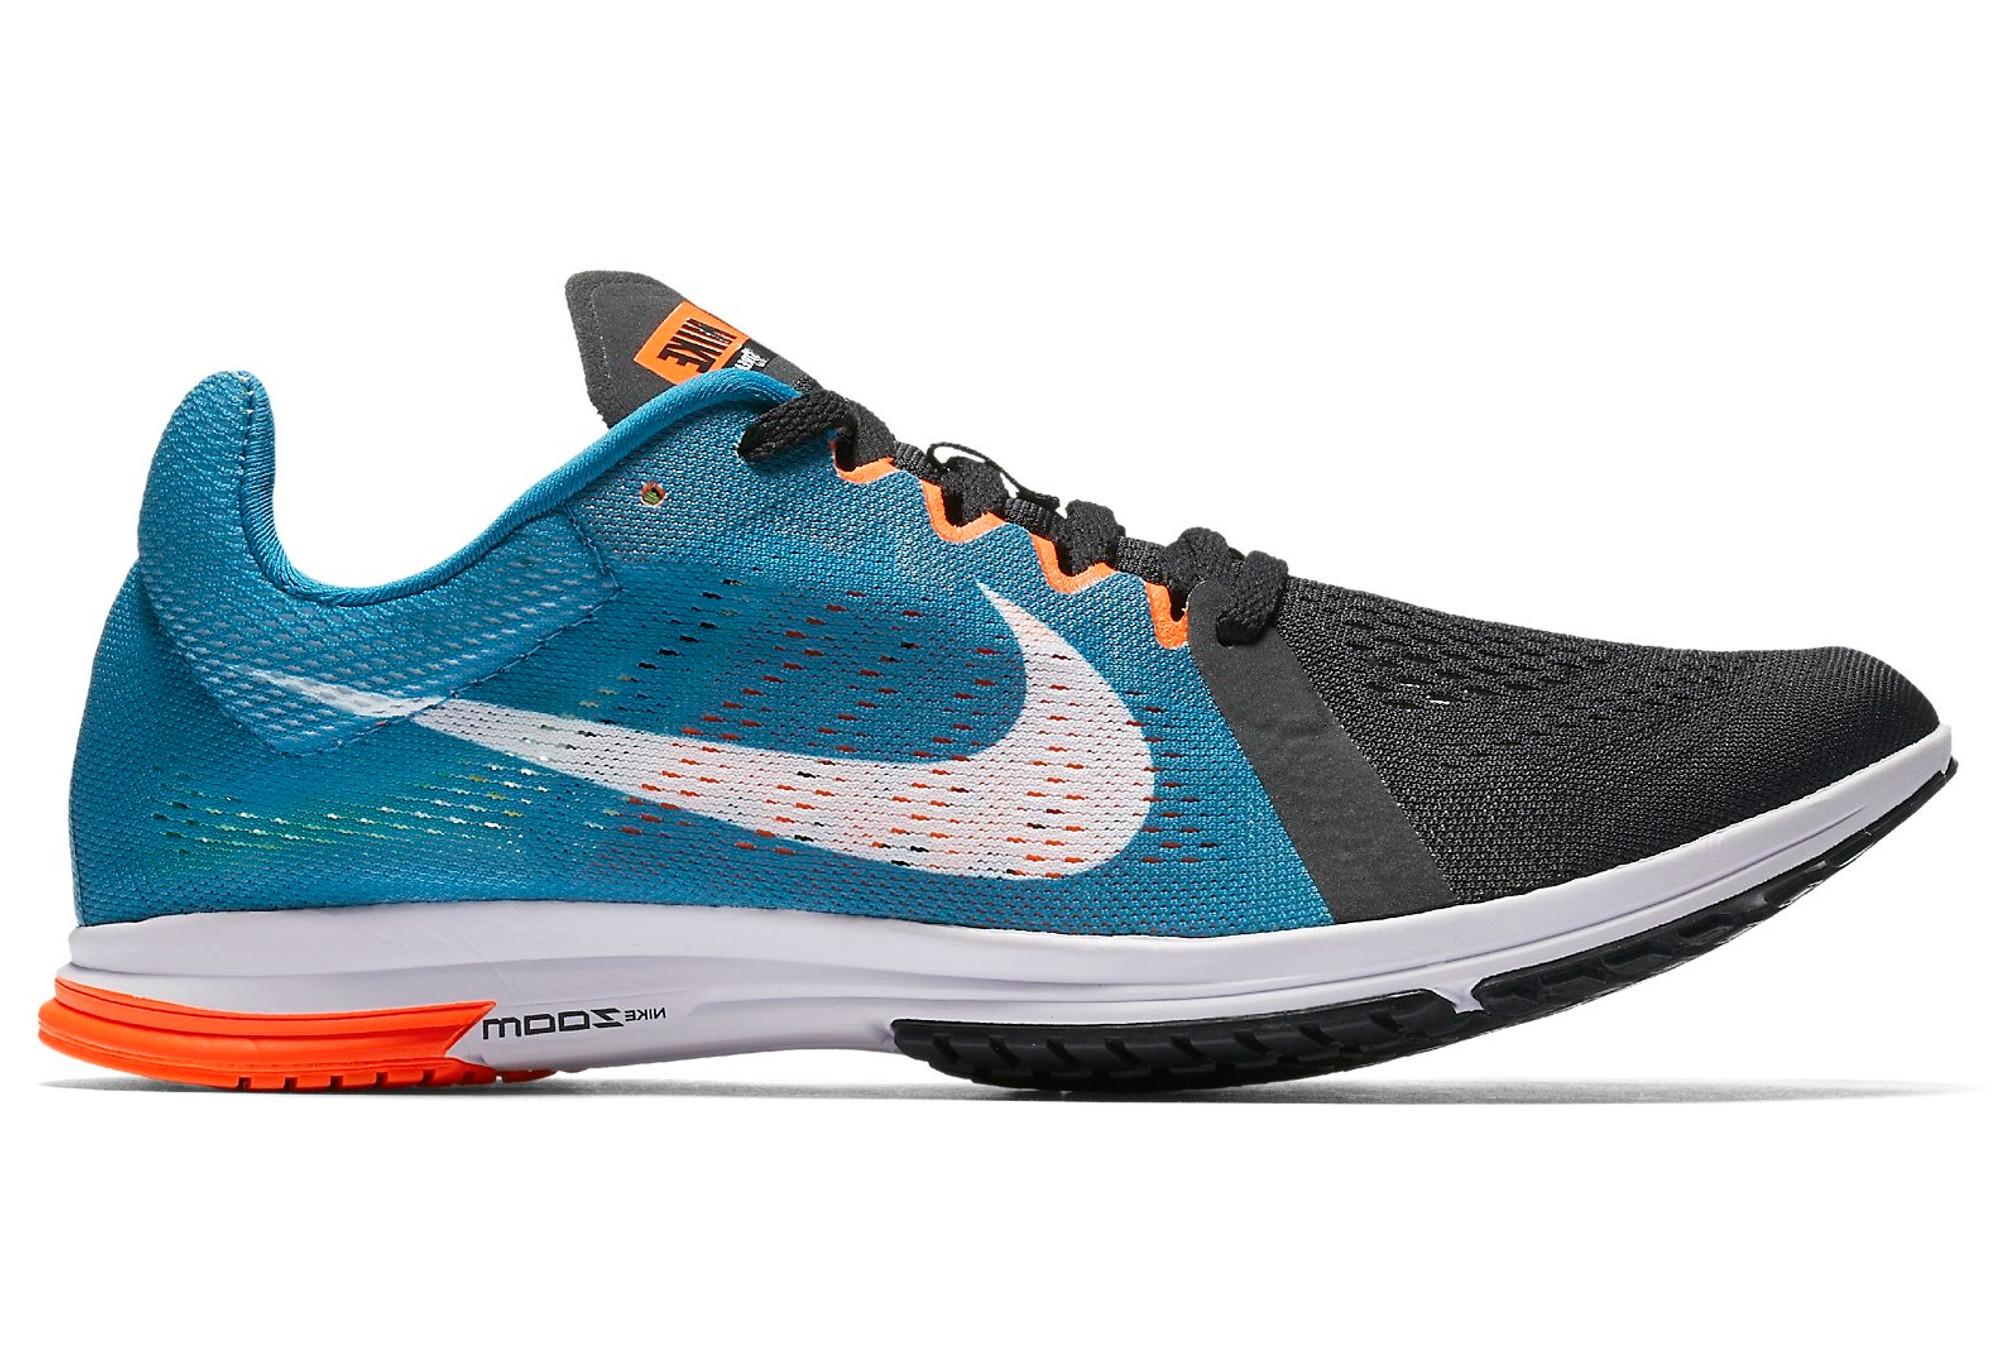 on sale 0a85d 1fd9f Nike Zoom Streak LT 3 Black Blue Orange Unisex